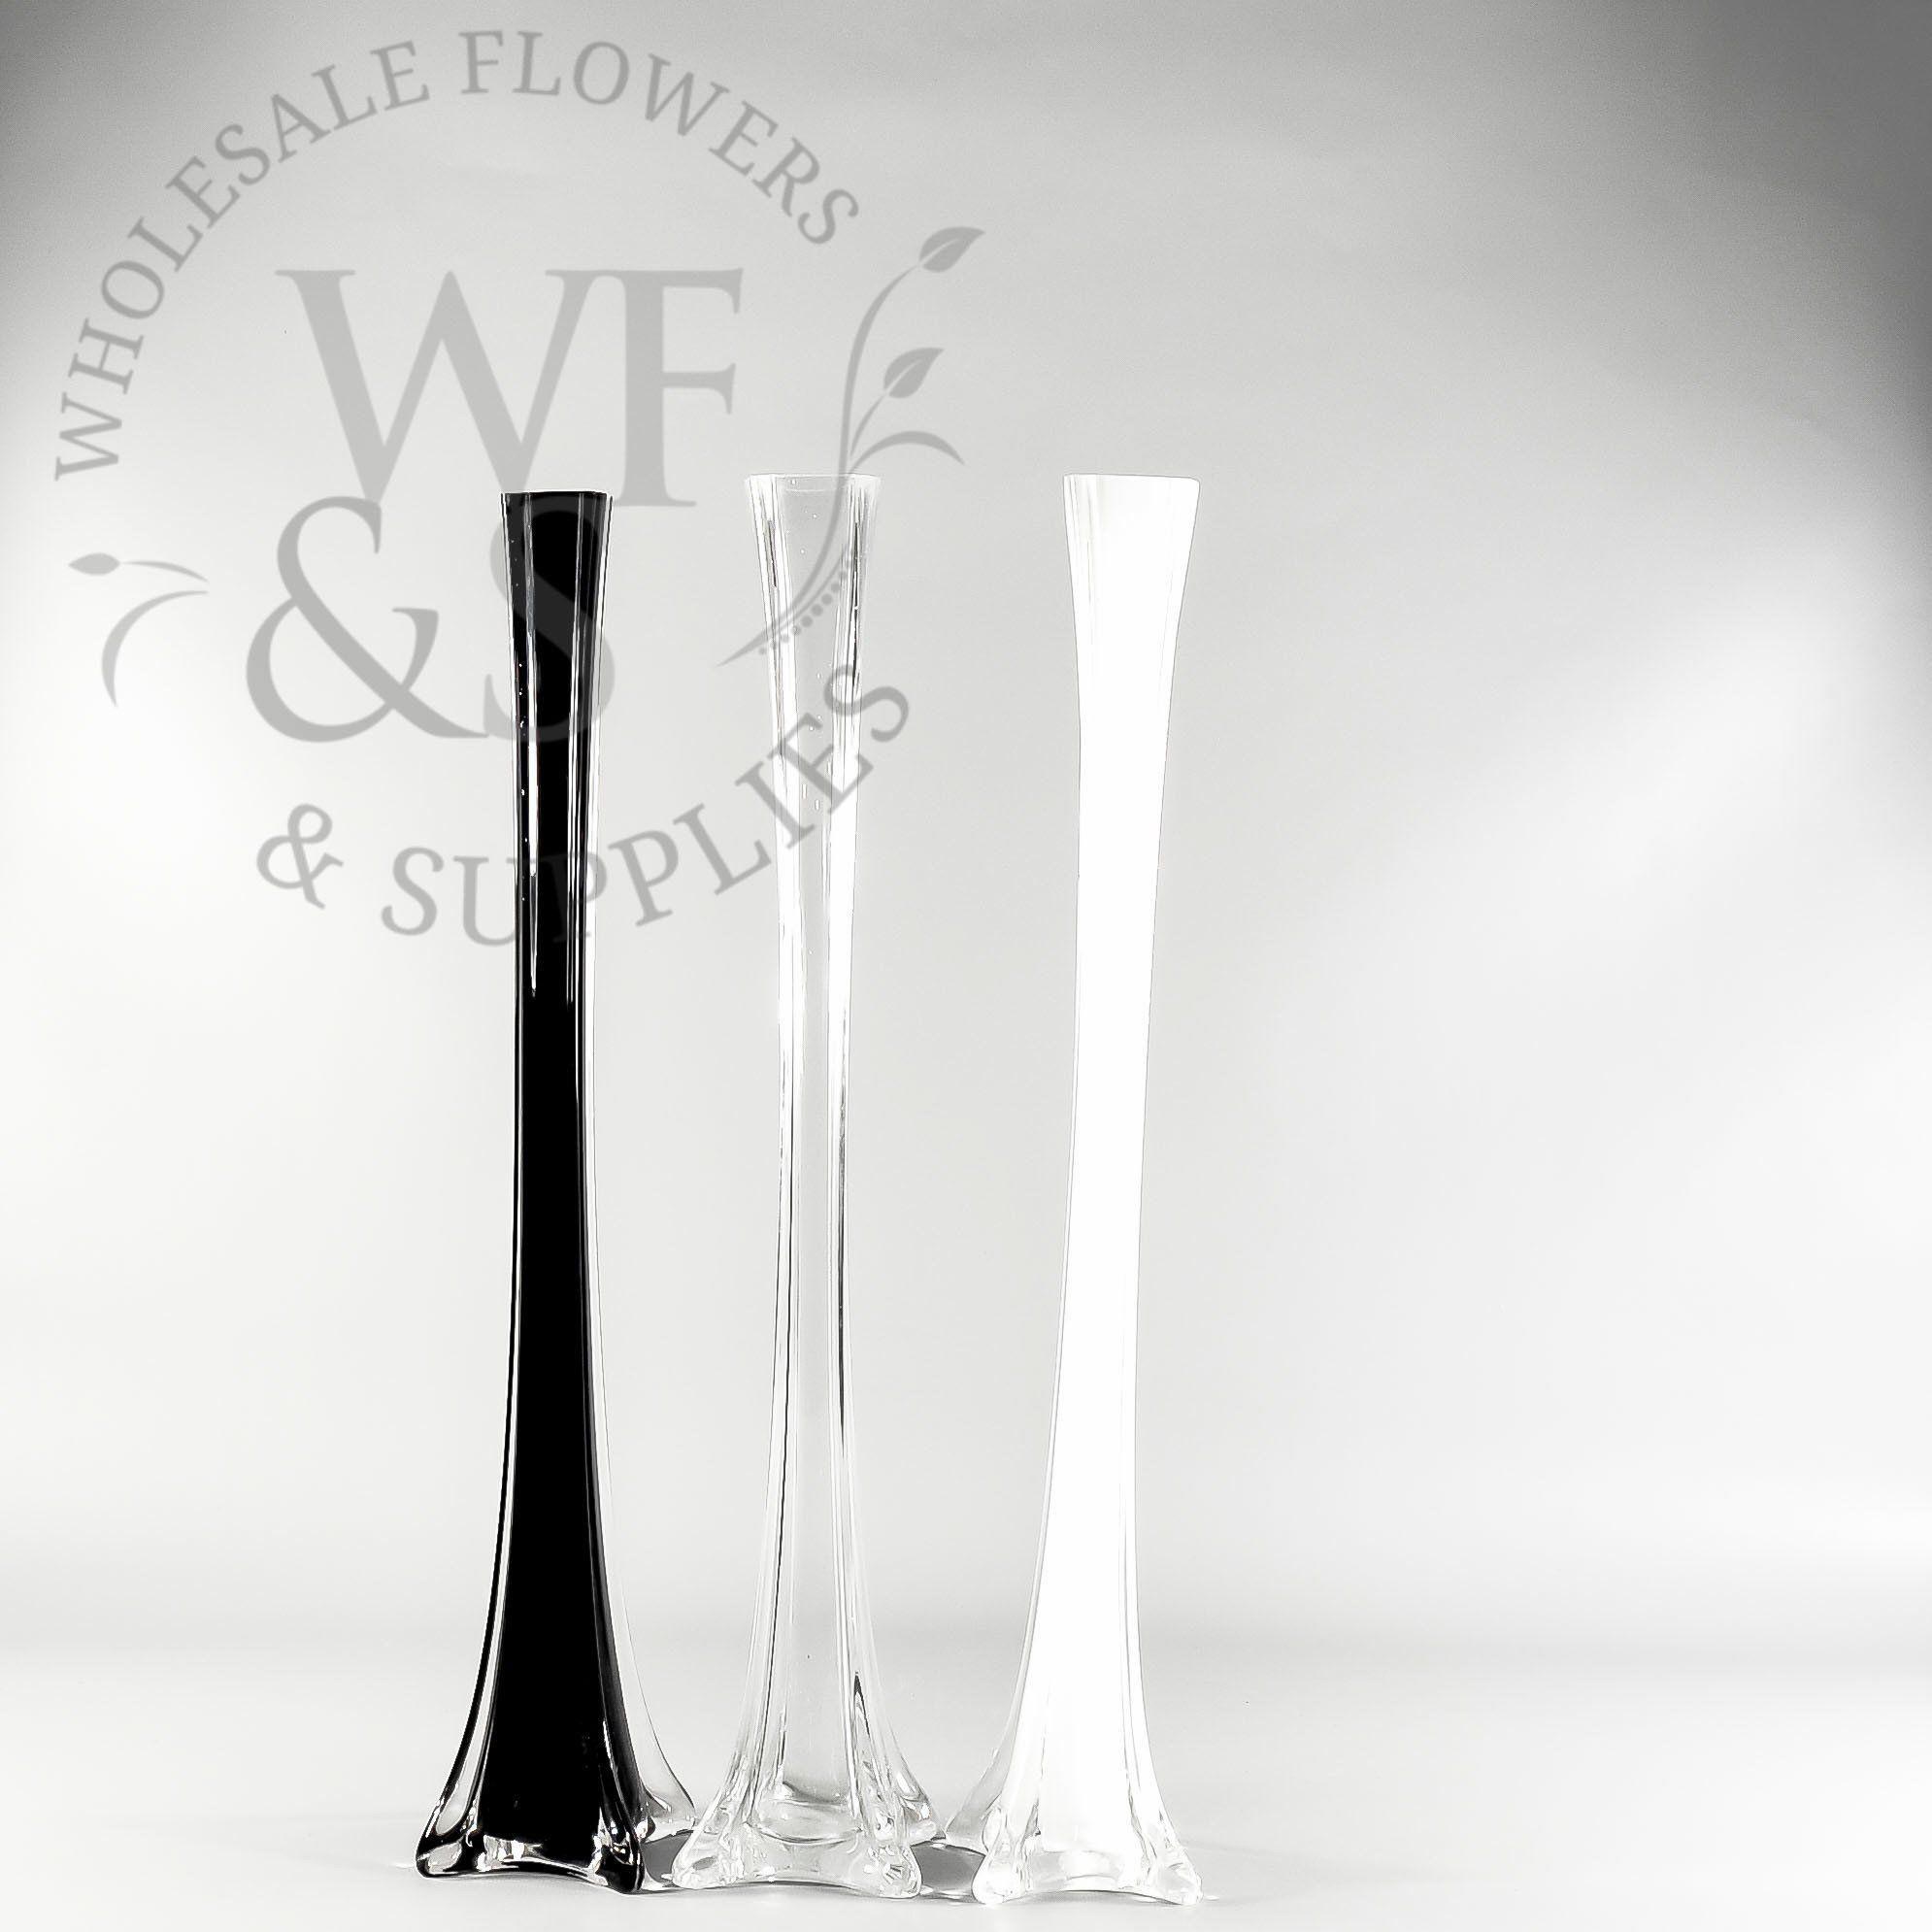 silver trumpet vases for sale of eiffel tower glass vase 20in flower bouquet ideas pinterest intended for 20 glass eiffel tower vase our price 4 50 height 20 opening diameter